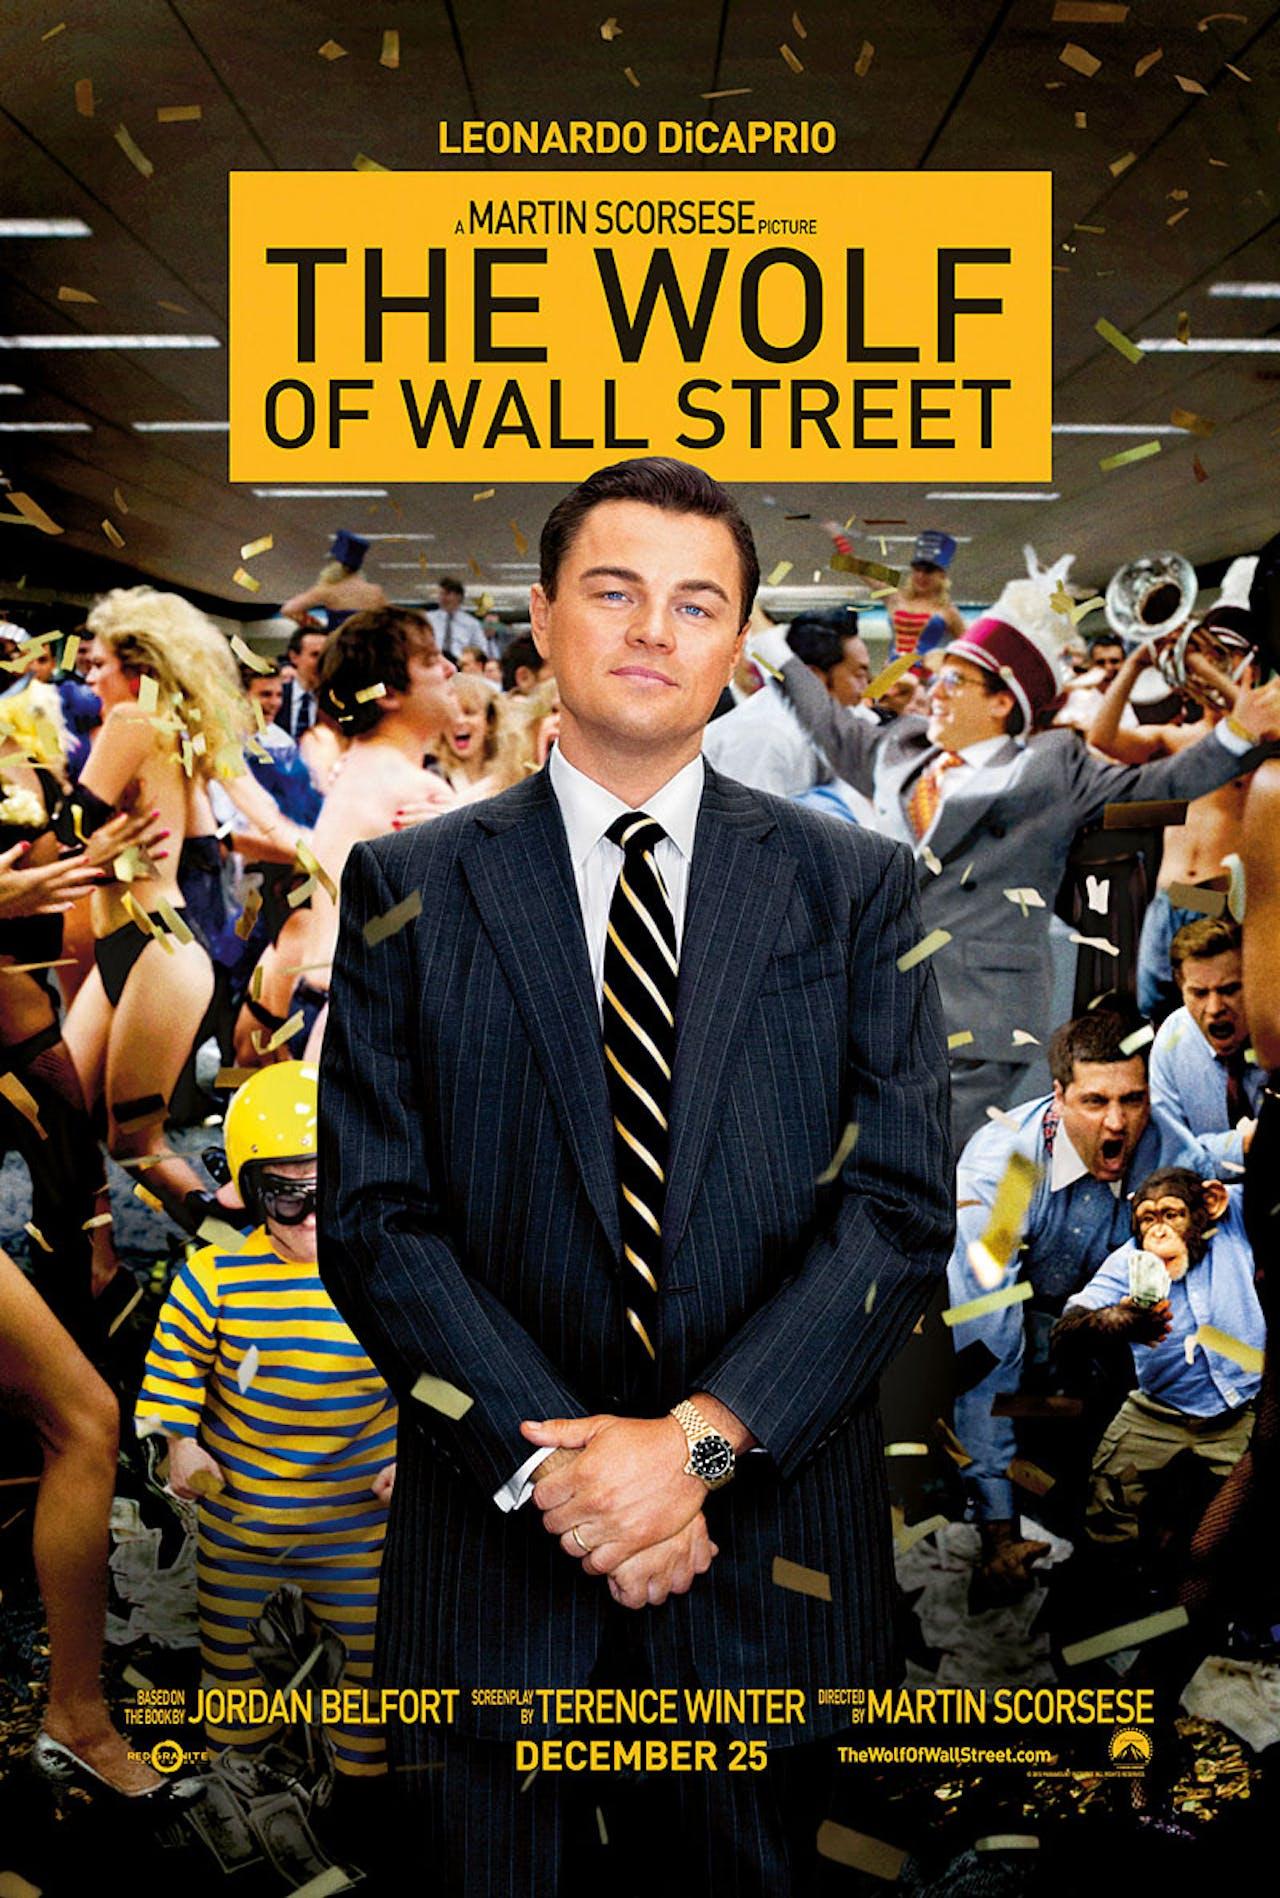 The Wolf of Wall Street (Martin Scorsese, 2013) | Lamborghini Countach 25th Anniversary